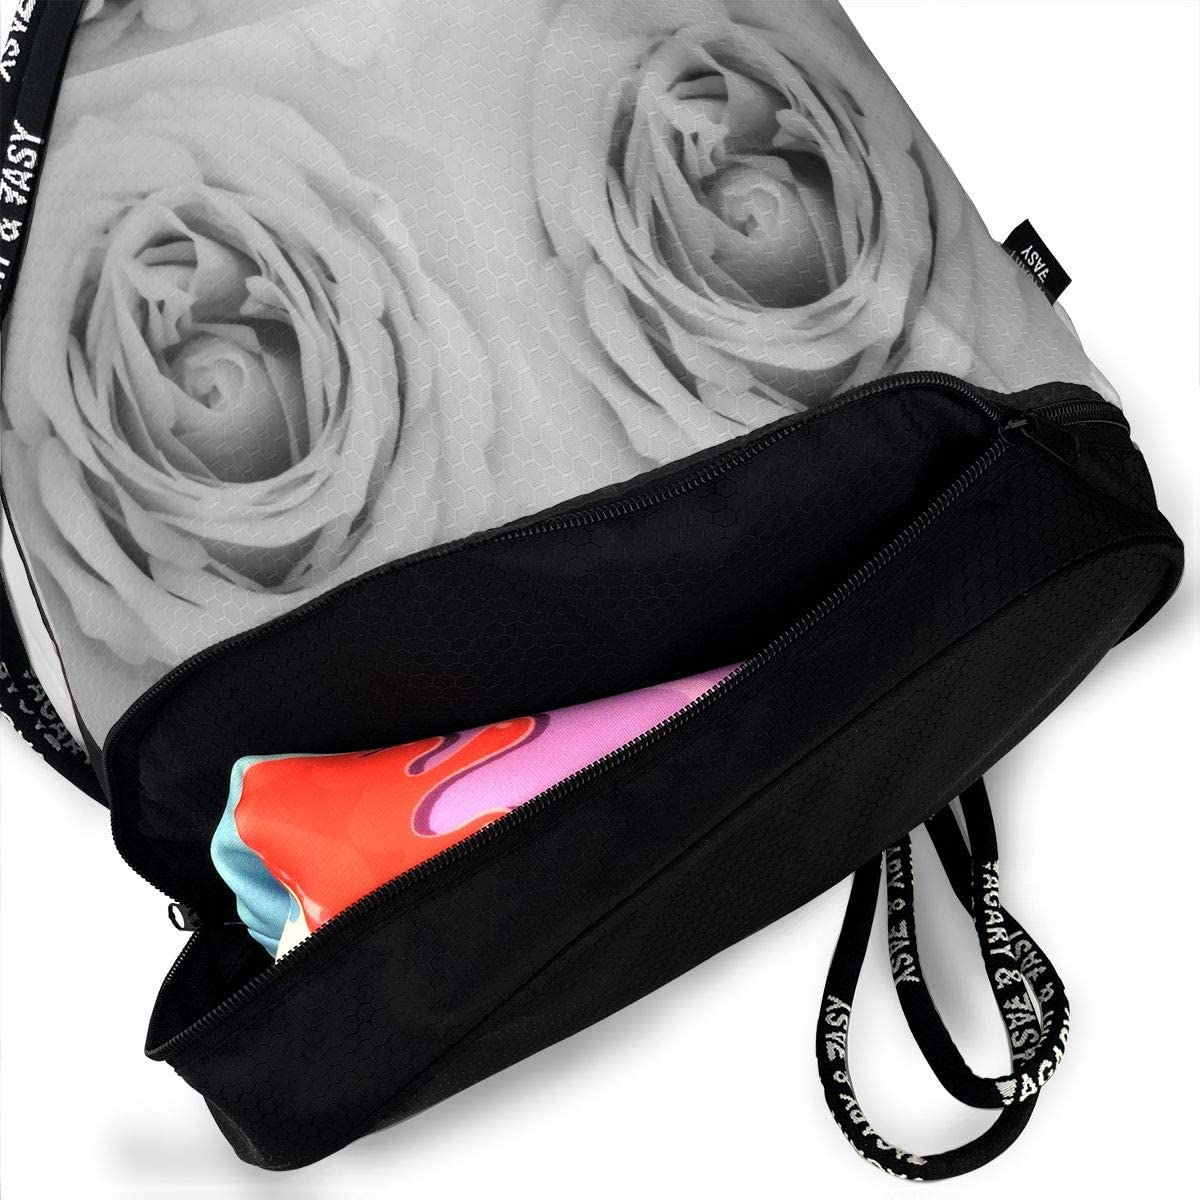 Drawstring Backpack Rose Grey Gym Bag